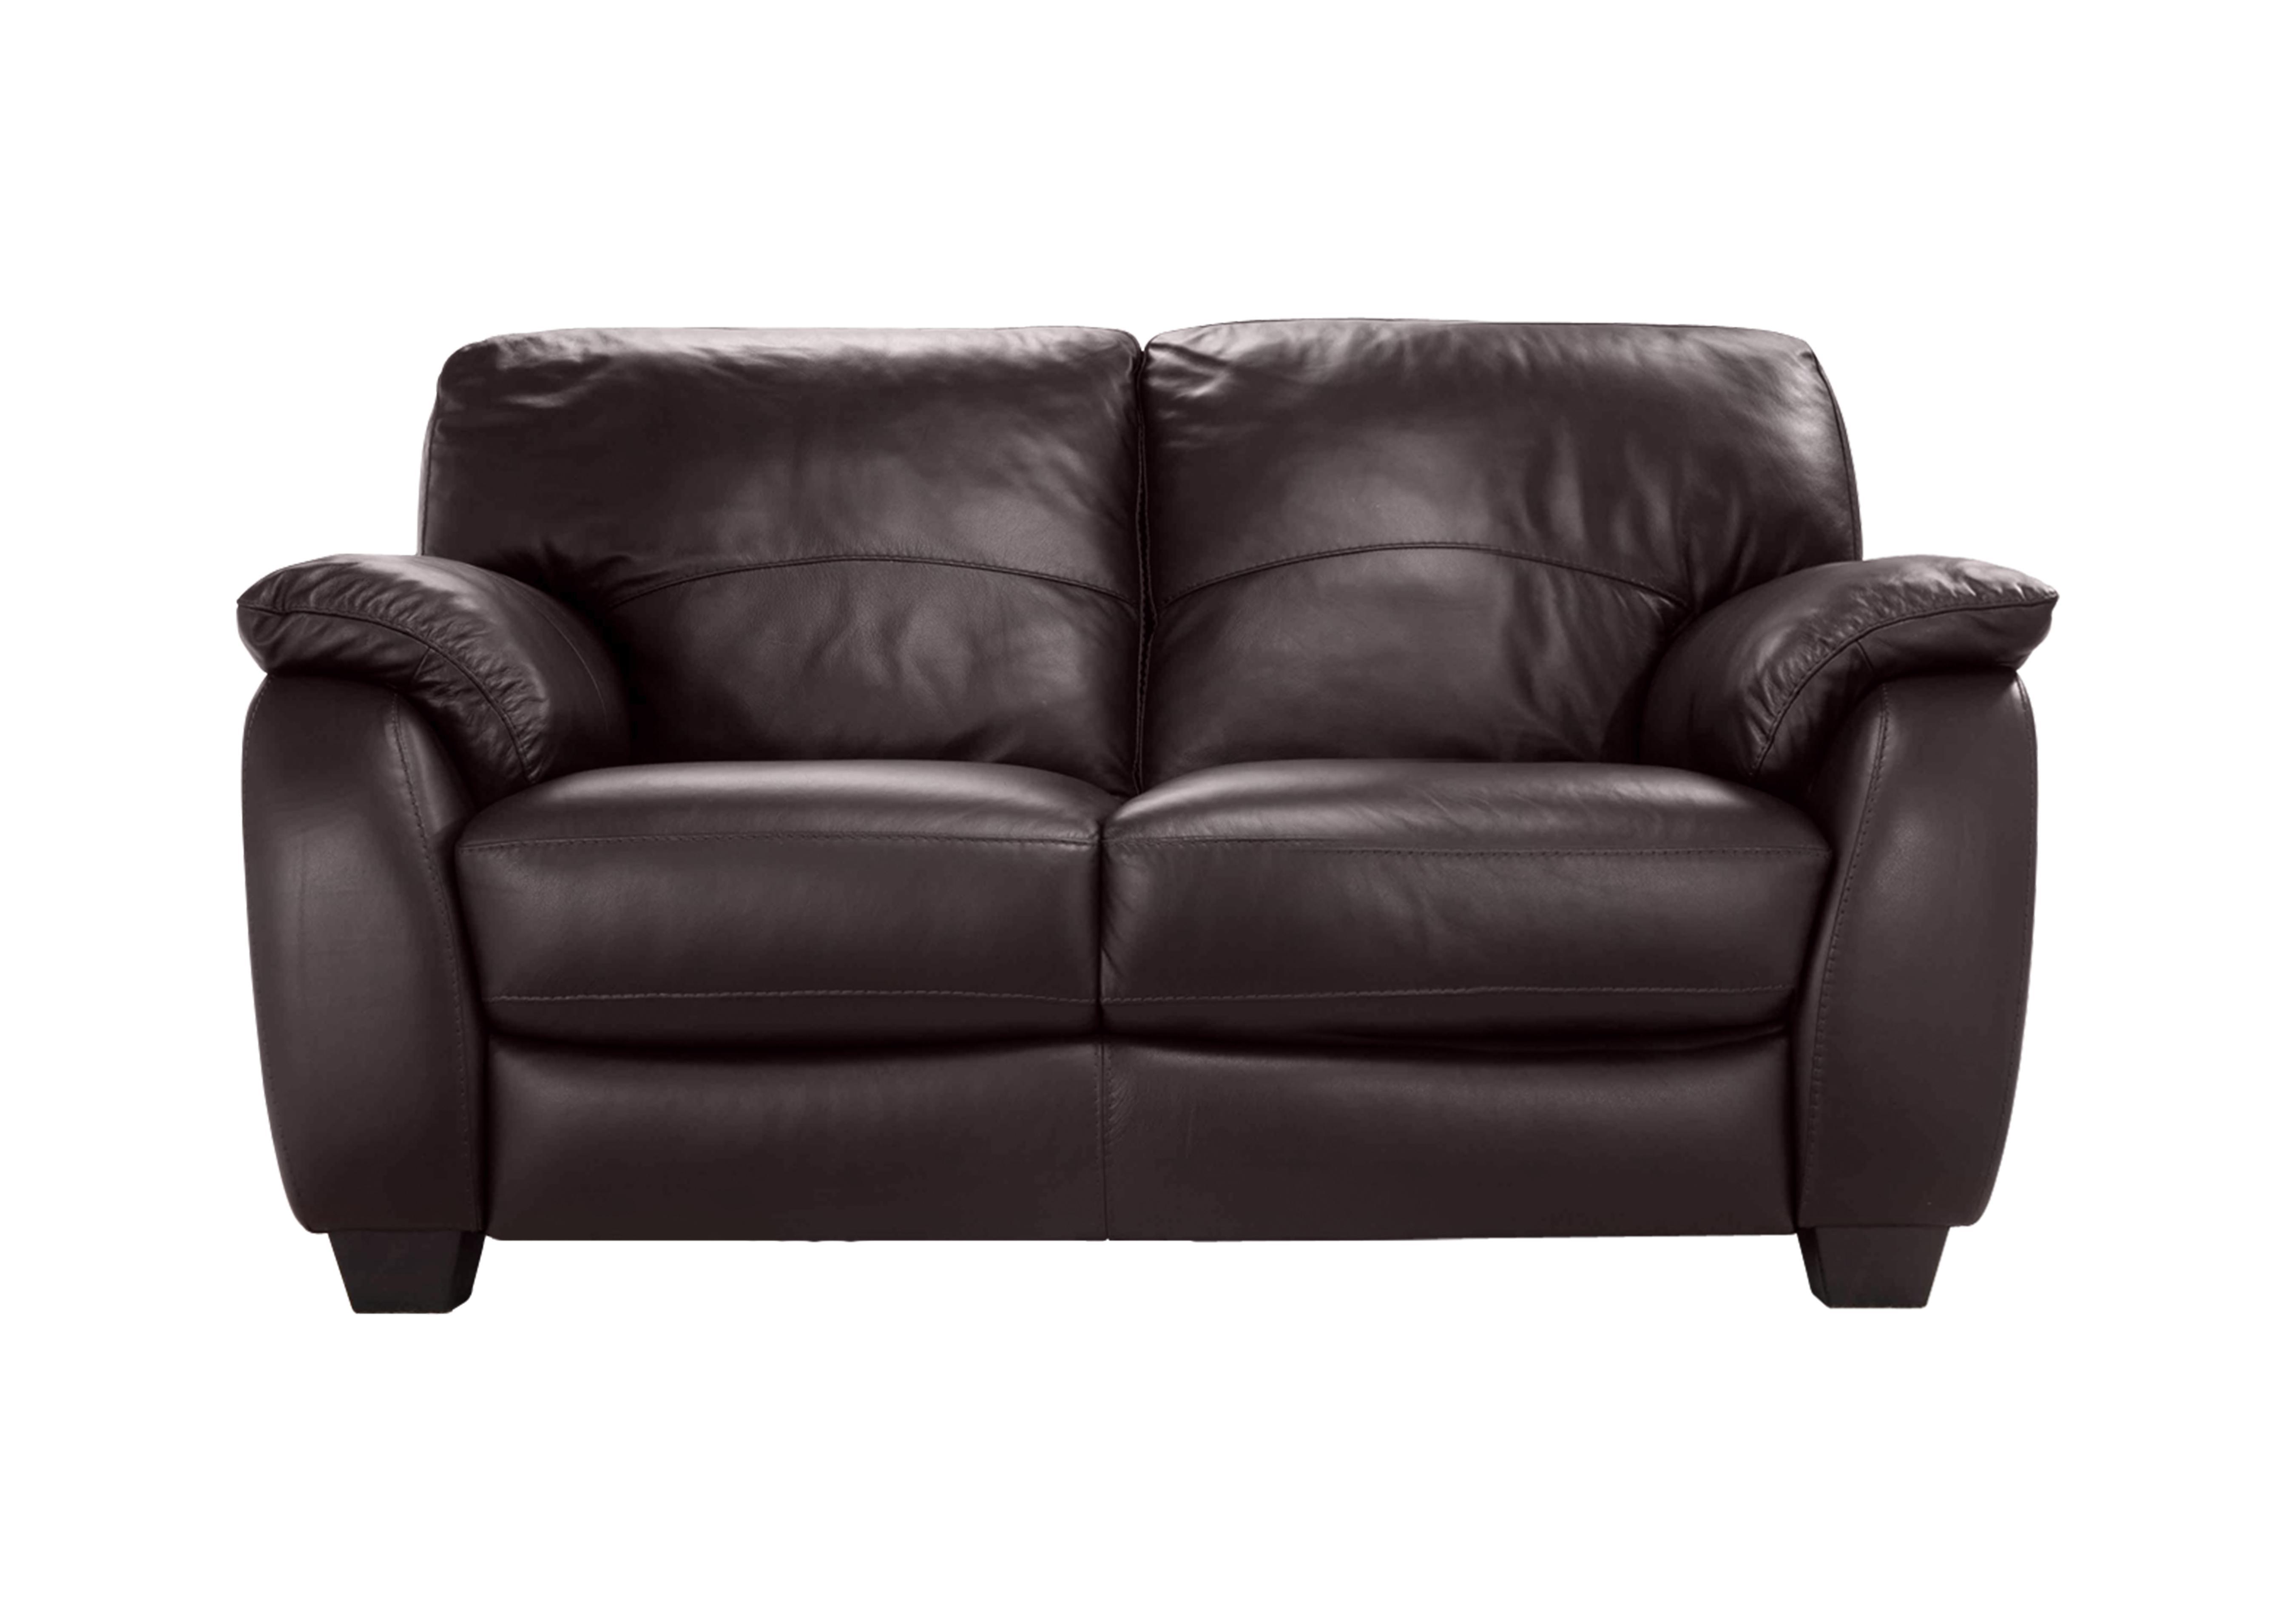 moods 3 seater leather sofa bed sofaer co restaurant yangon 2 brokeasshome